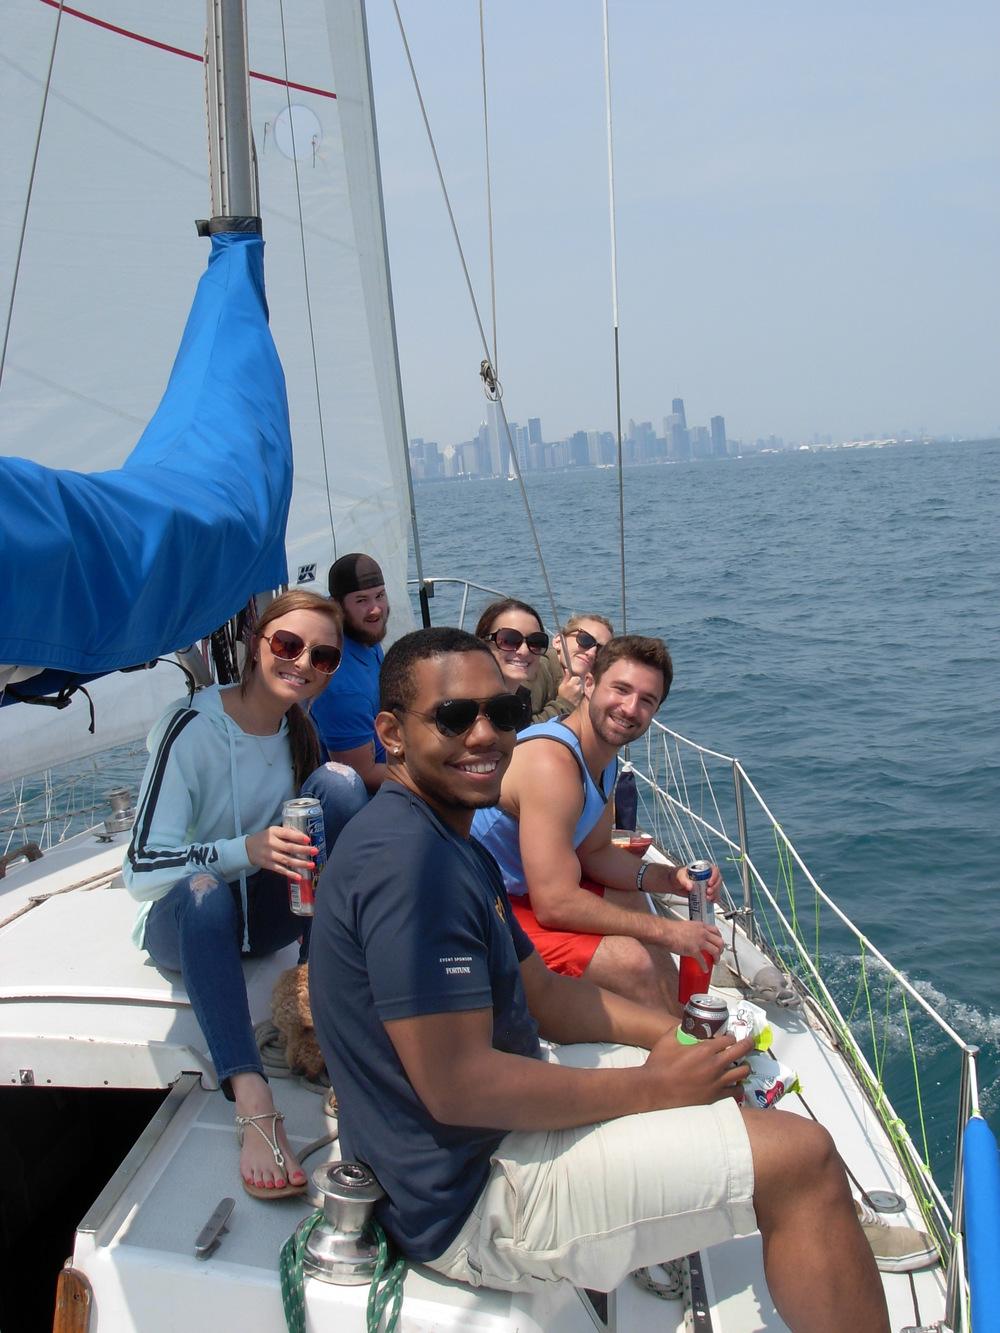 Salty Dog Sailing Chicago Charter Boat Tour July 4 2015_9.JPG